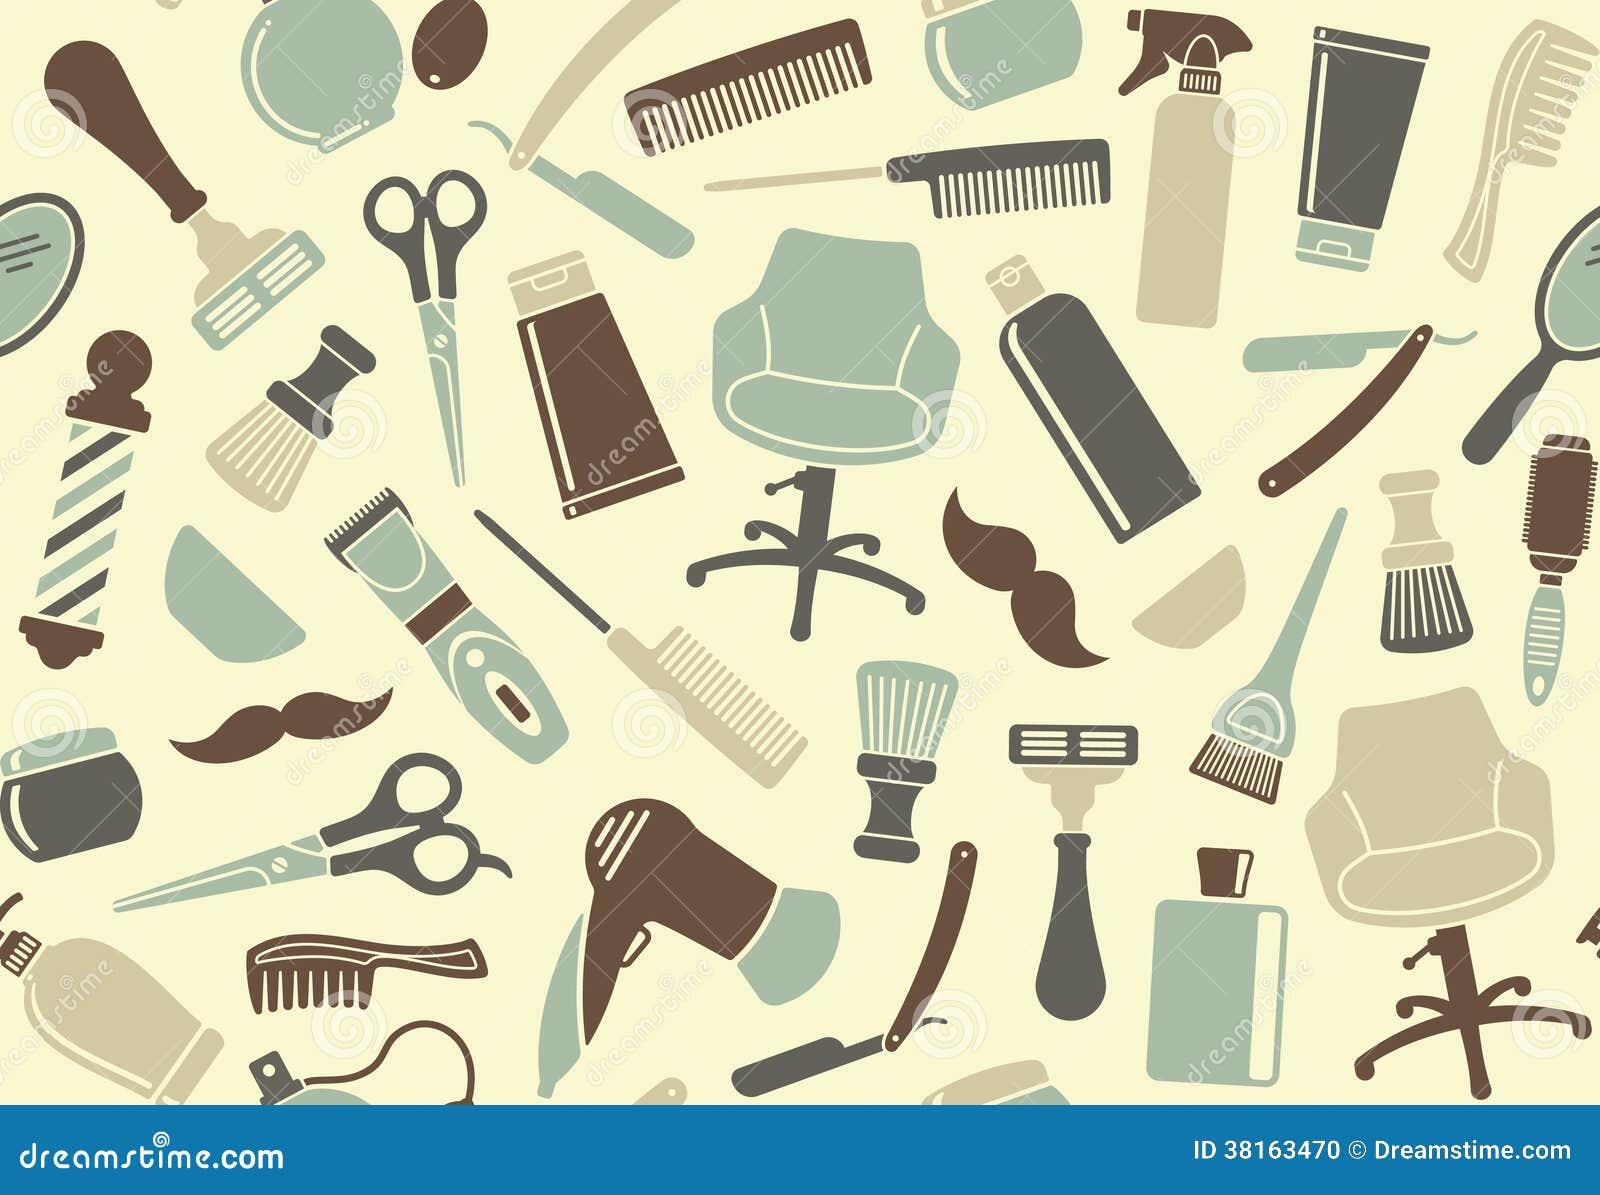 Barber Background : 22 Barbershop Seamless Background Stock Photo Image 38163470